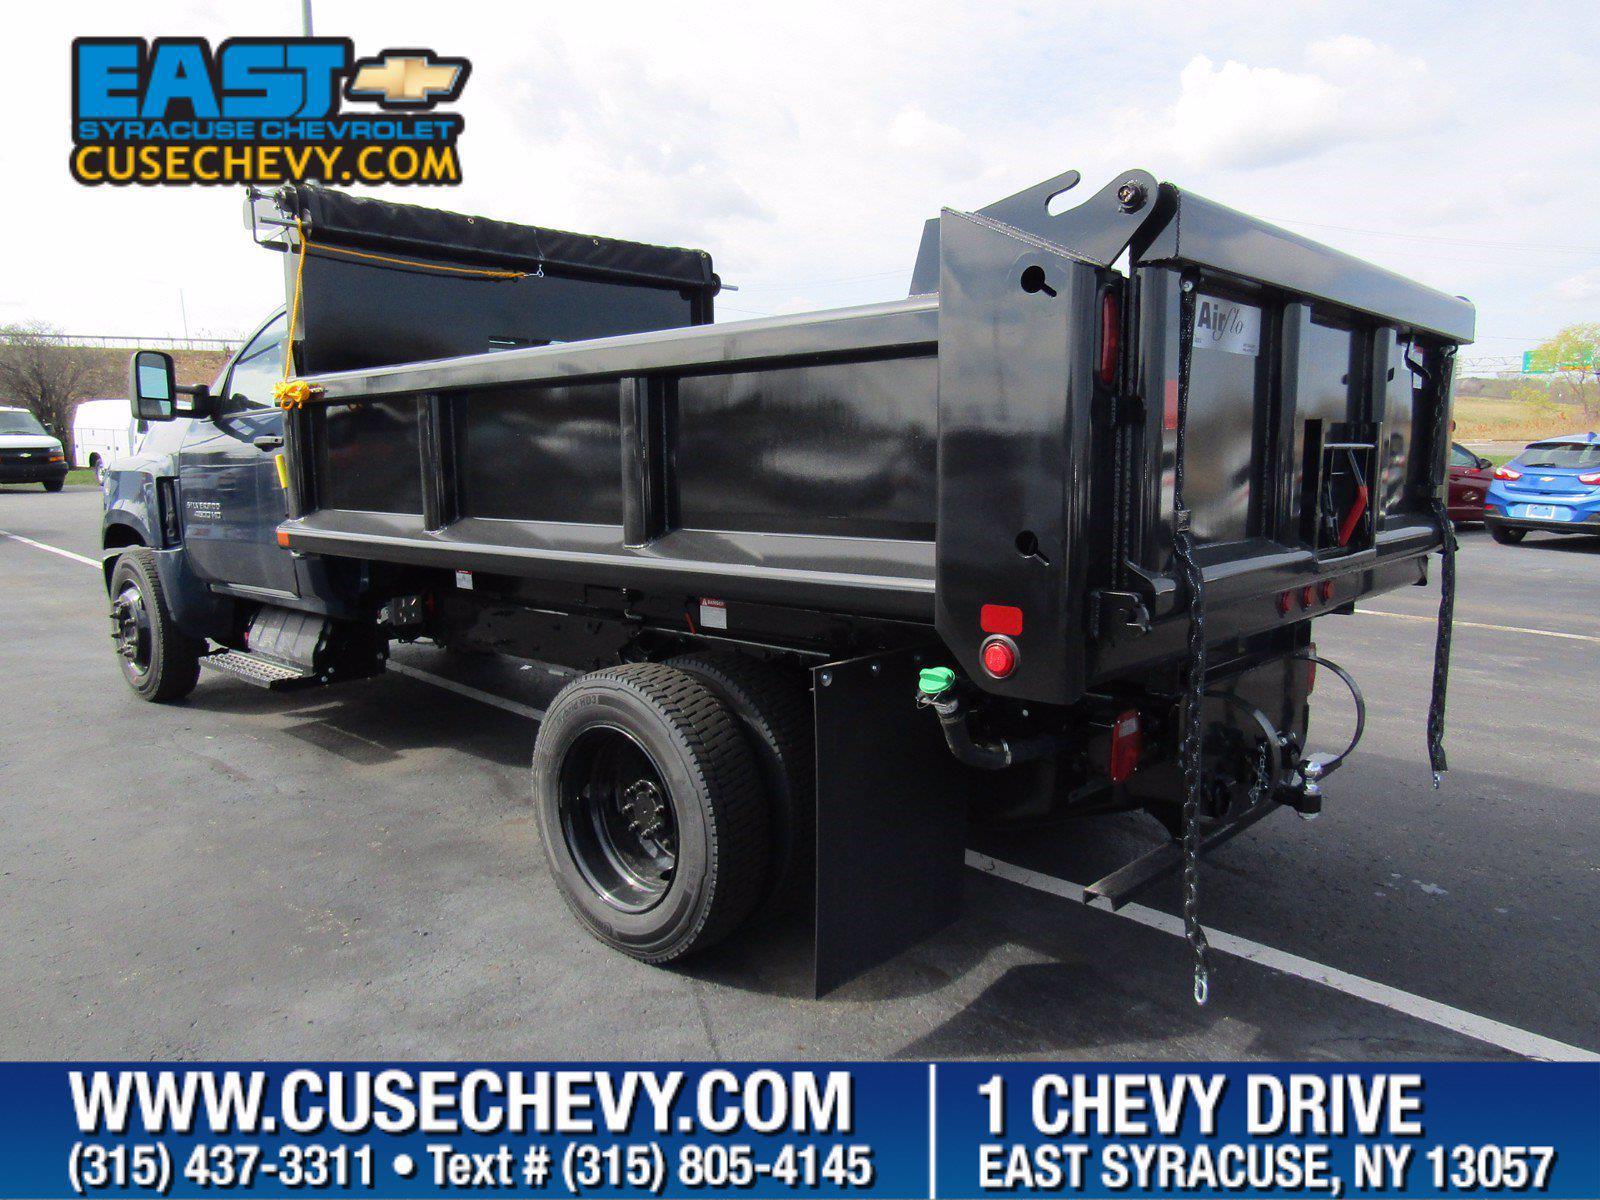 2021 Chevrolet Silverado 4500 Regular Cab DRW 4x2, Cab Chassis #17904 - photo 1